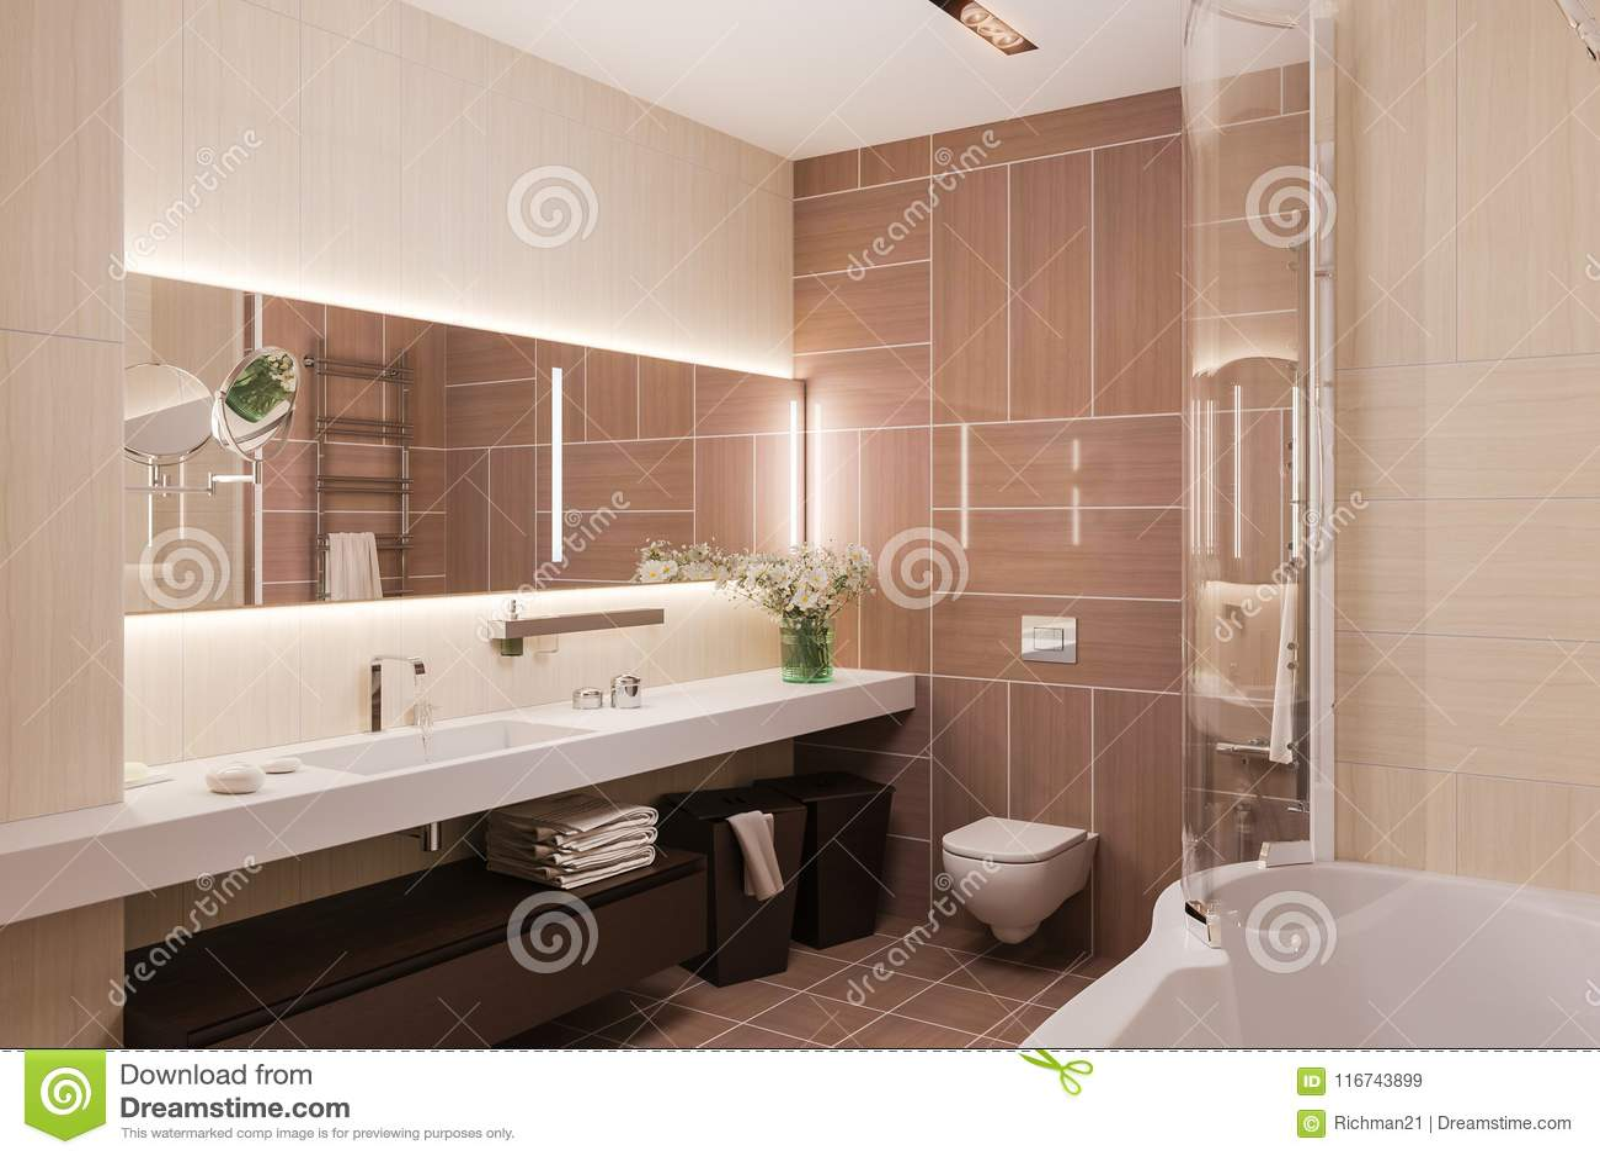 3d Rinden Diseño Interior De Un Cuarto De Baño Moderno Con Un Mirr ...